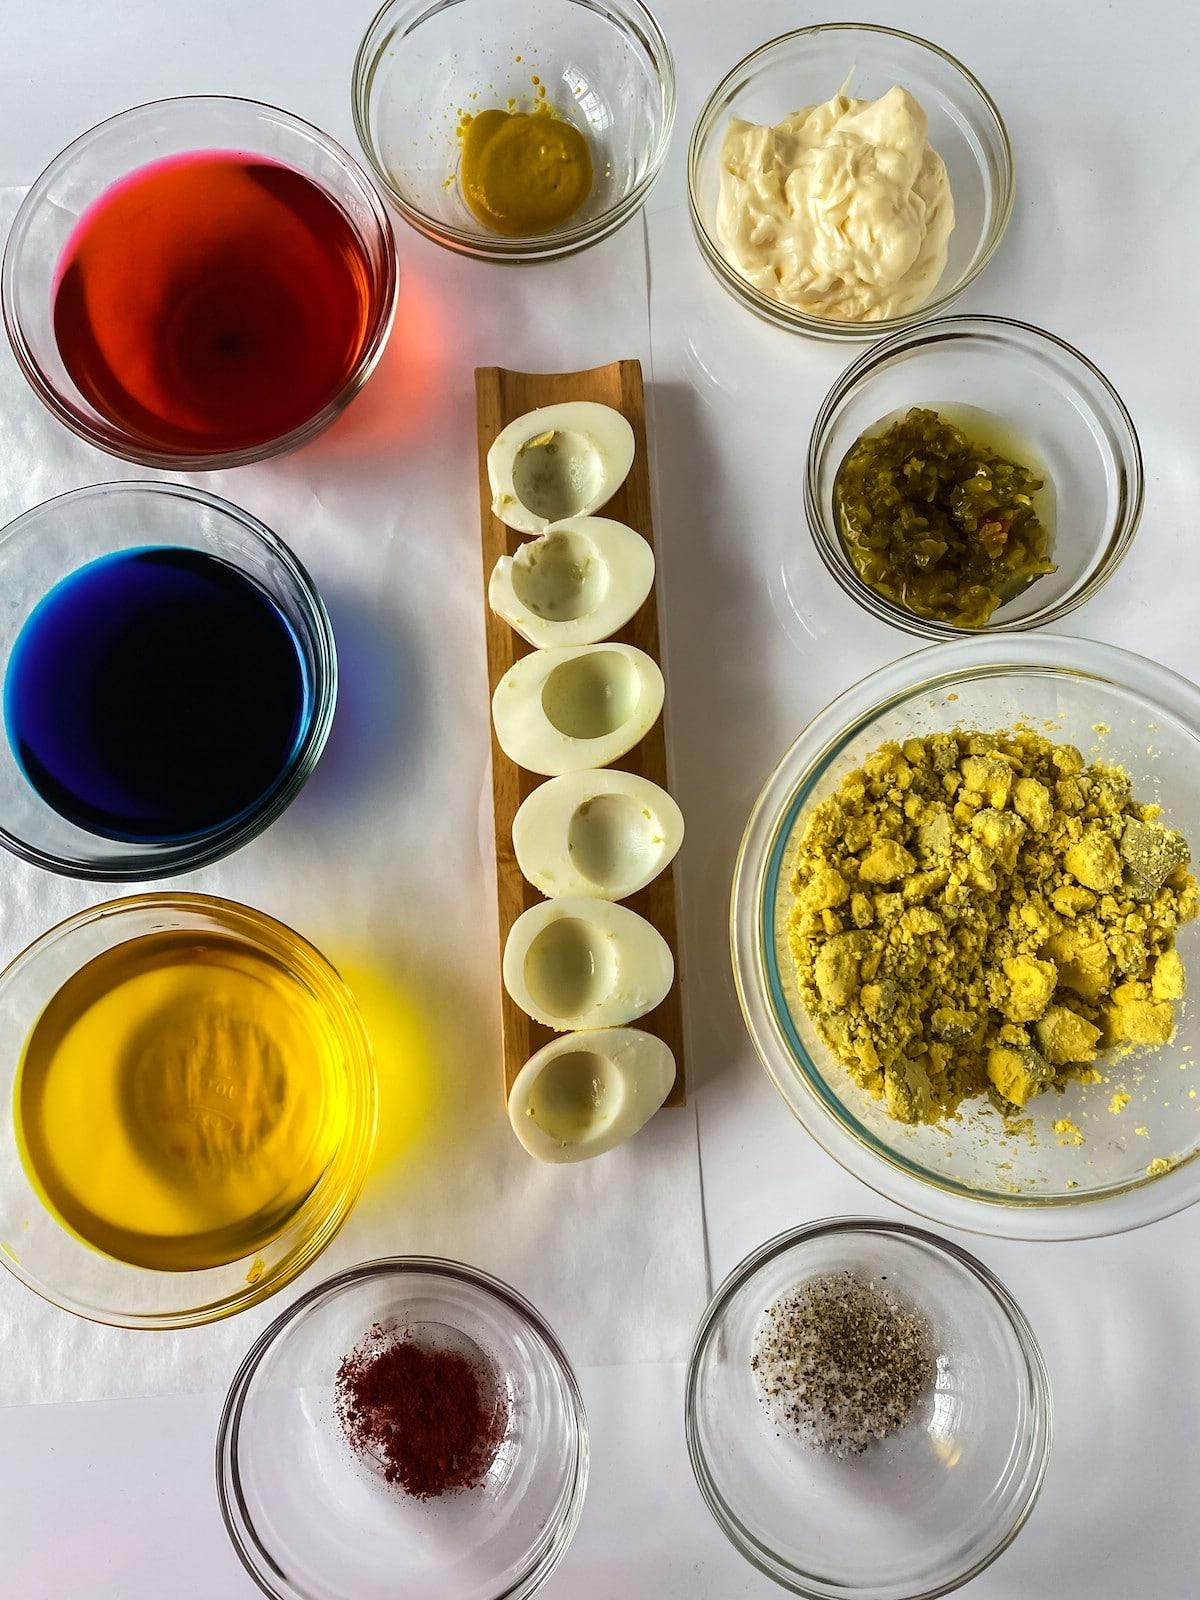 Ingredients for Easter deviled eggs